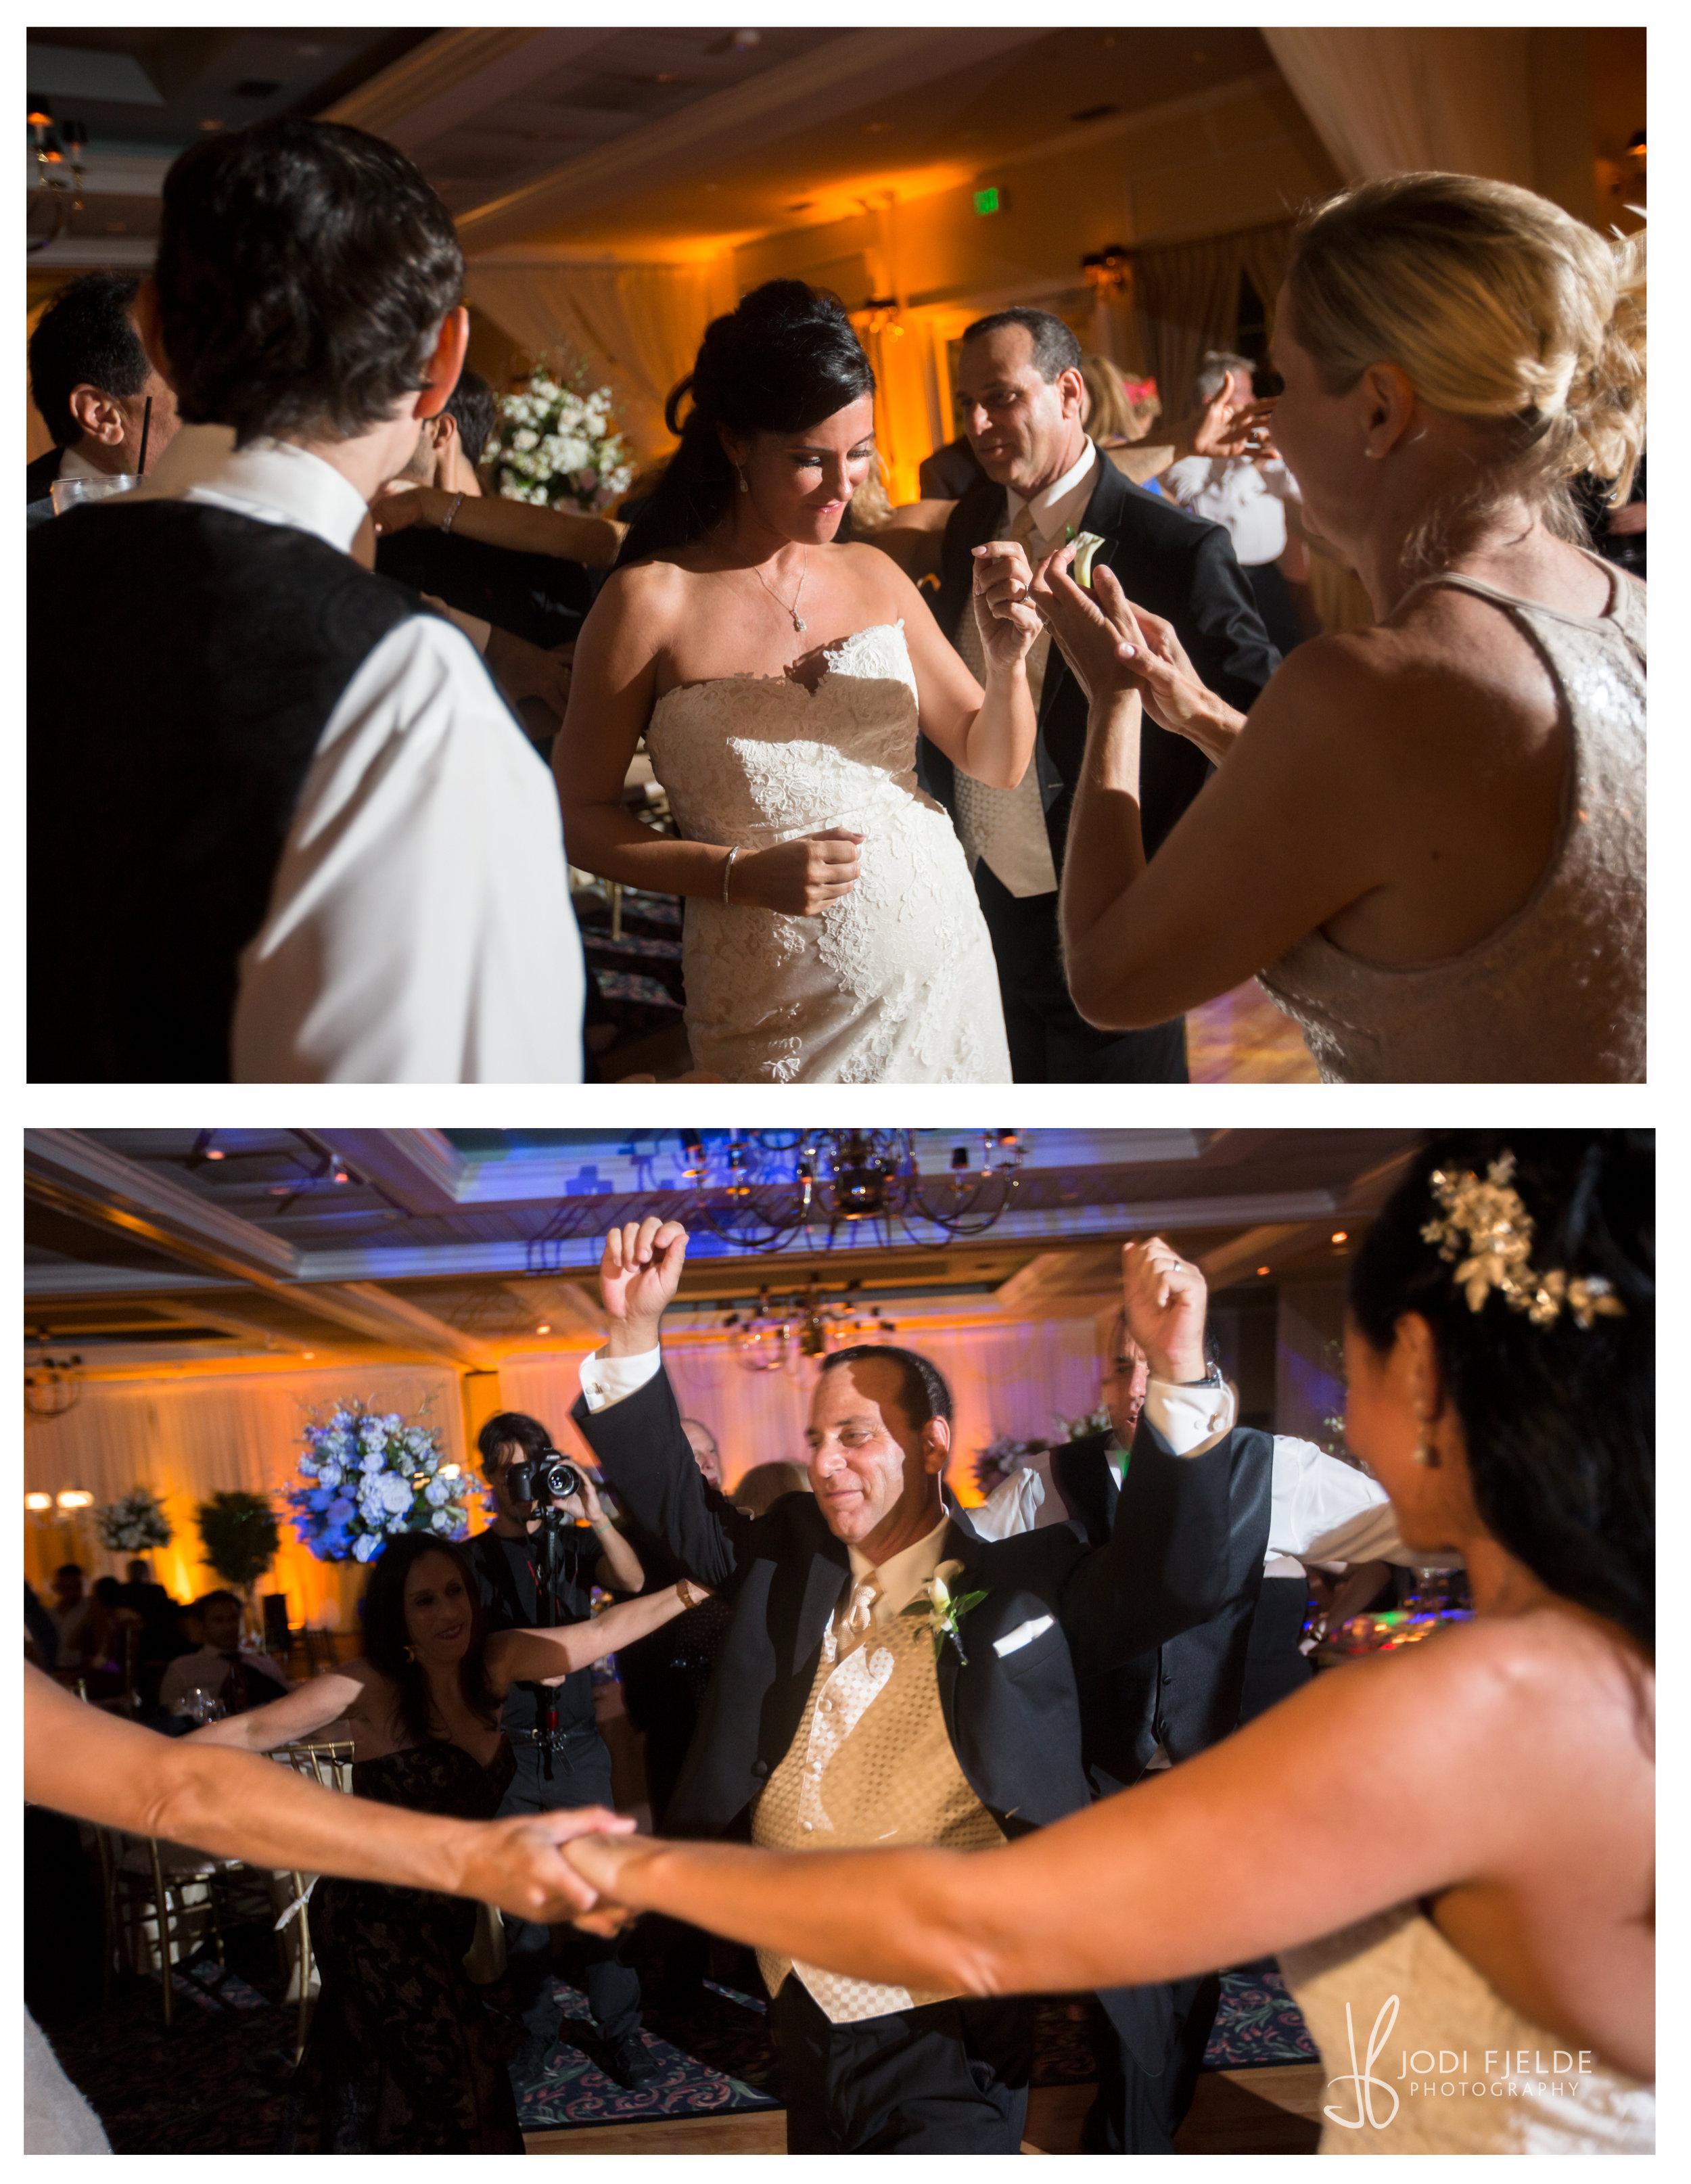 Benvenuto_Boynton_Beach_Wedding_Christine_and Doug_Married 14.jpg